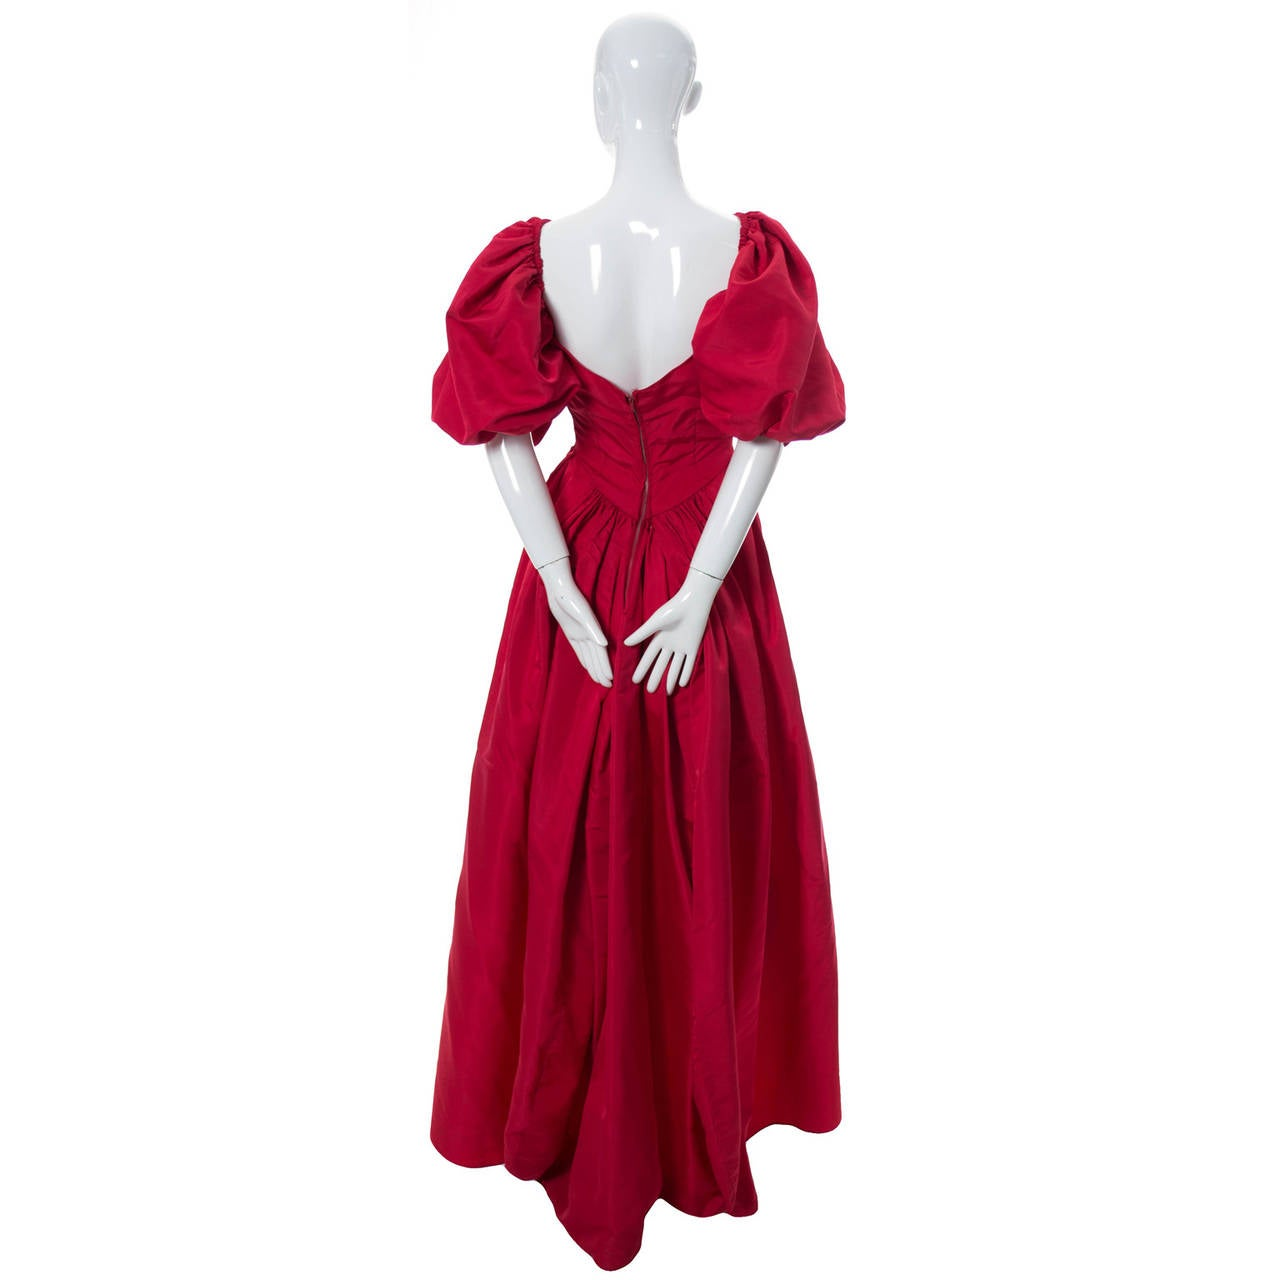 Rosalie MaCrini 1950's red satin formal vintage dress at ...- photo #50